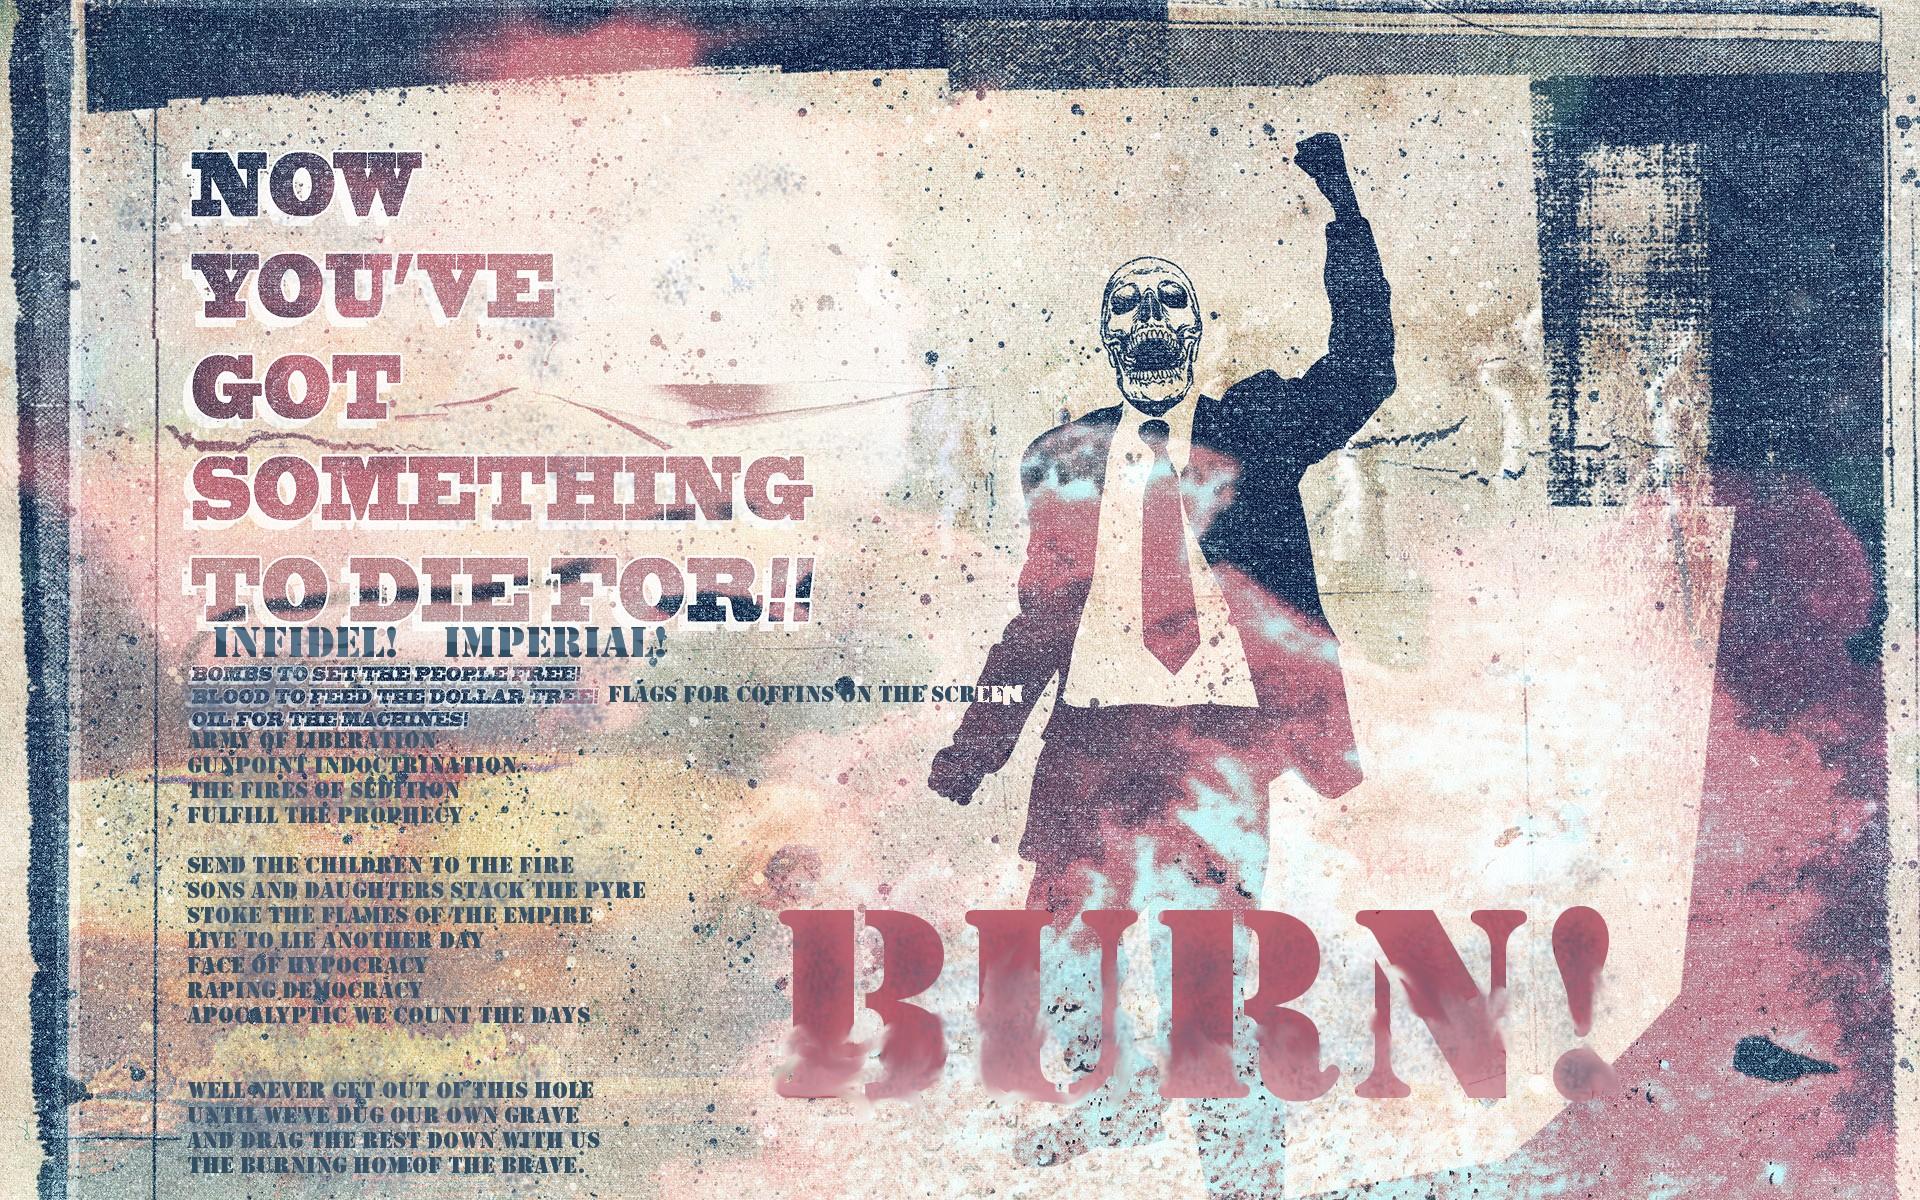 tie digital art graffiti text wall burn war skull burning